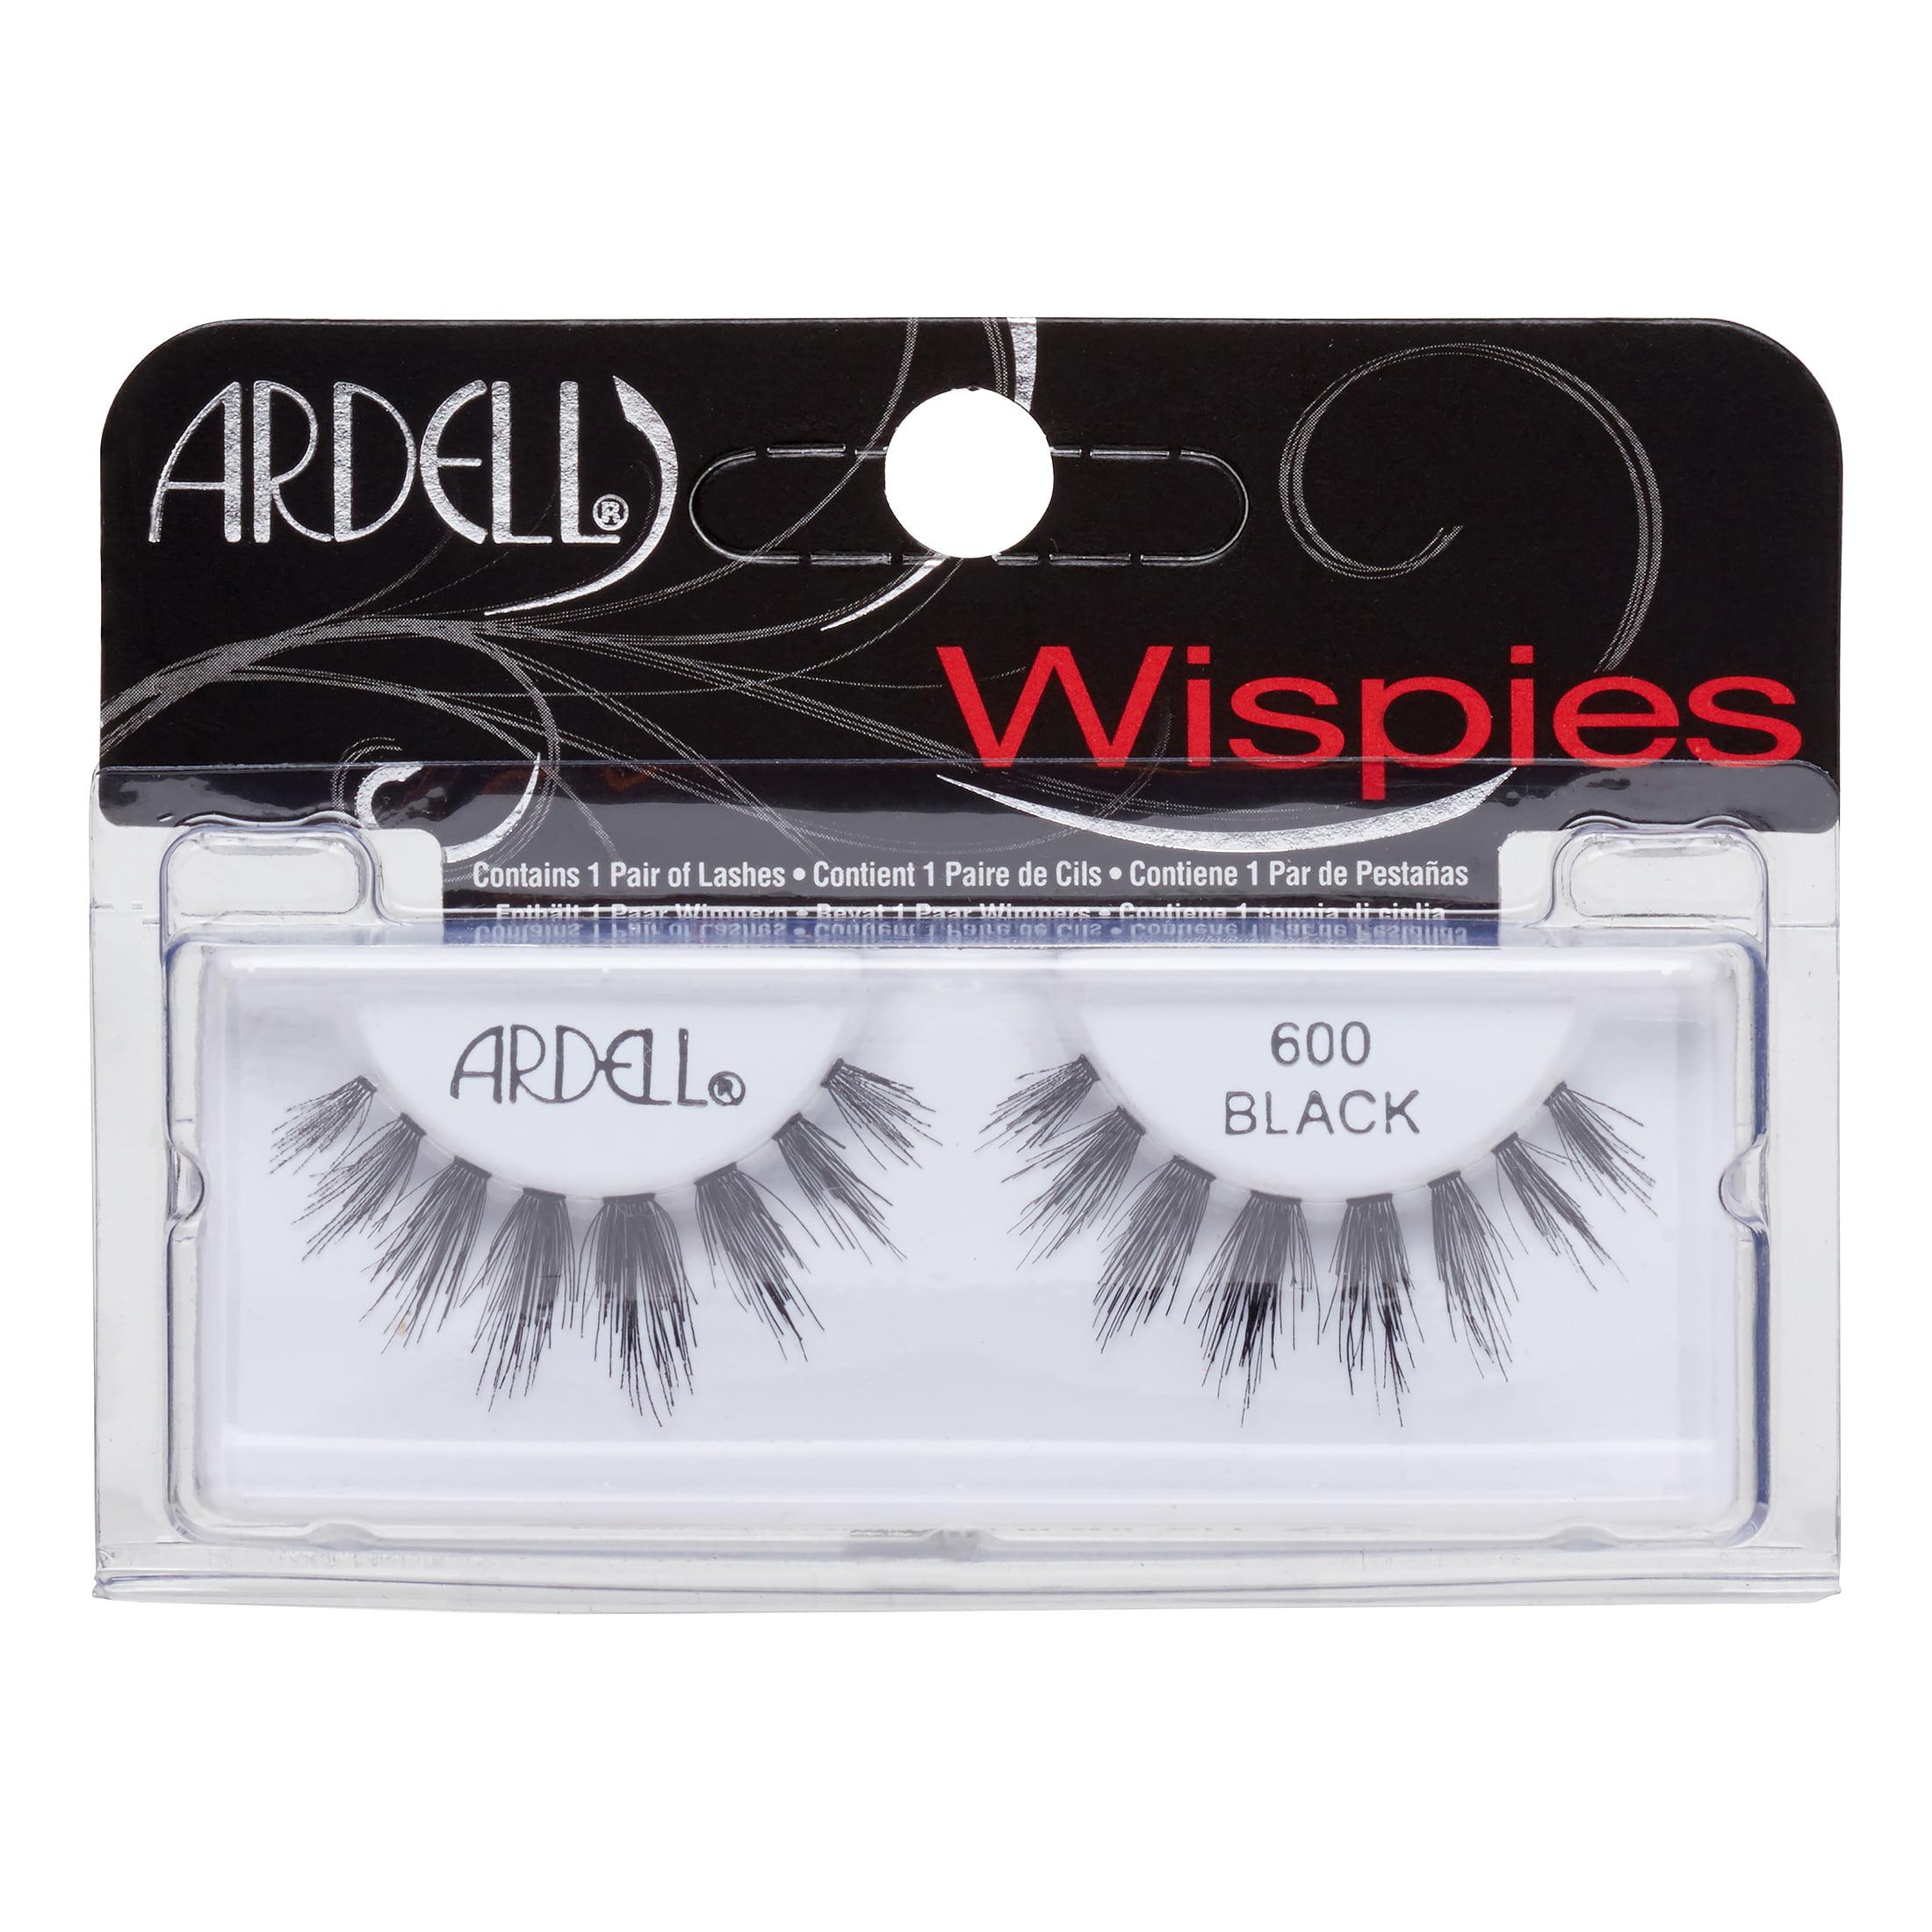 Ardell Cluster Wispies False Eyelashes, # 600 Black, 1 pair